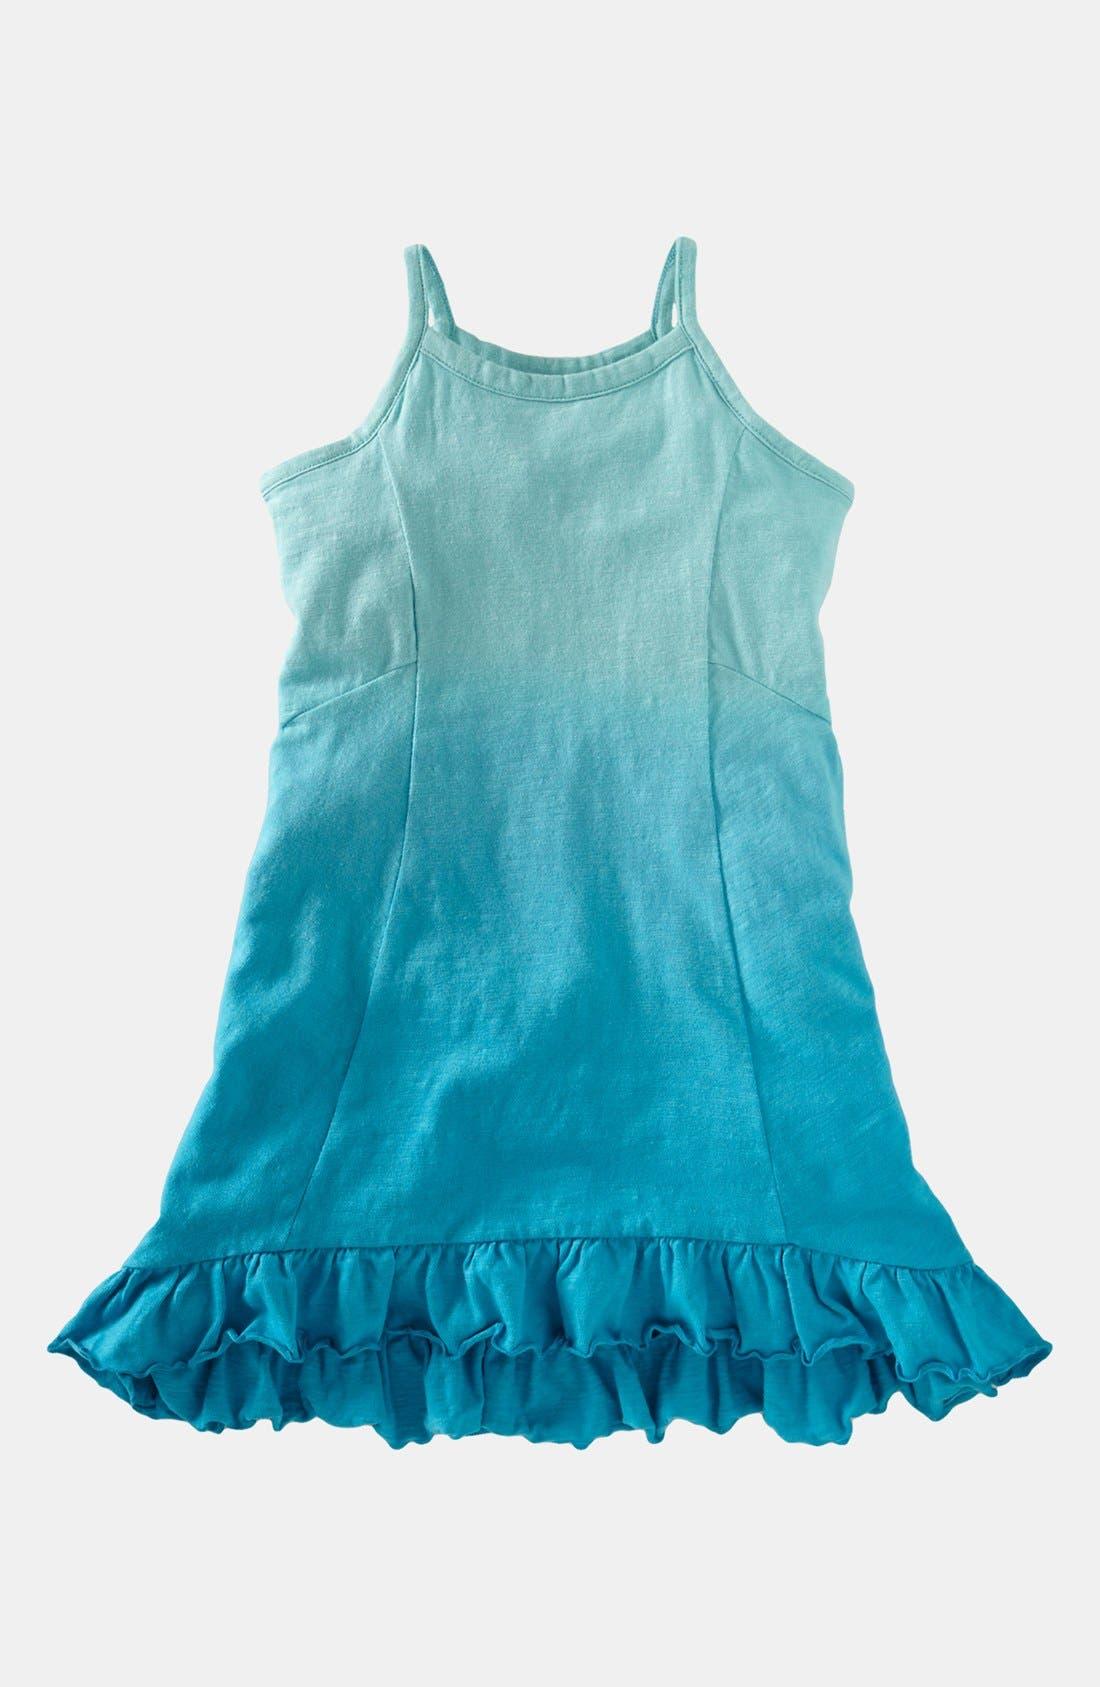 Alternate Image 1 Selected - Tea Collection 'Seafarer' Dress (Little Girls & Big Girls)